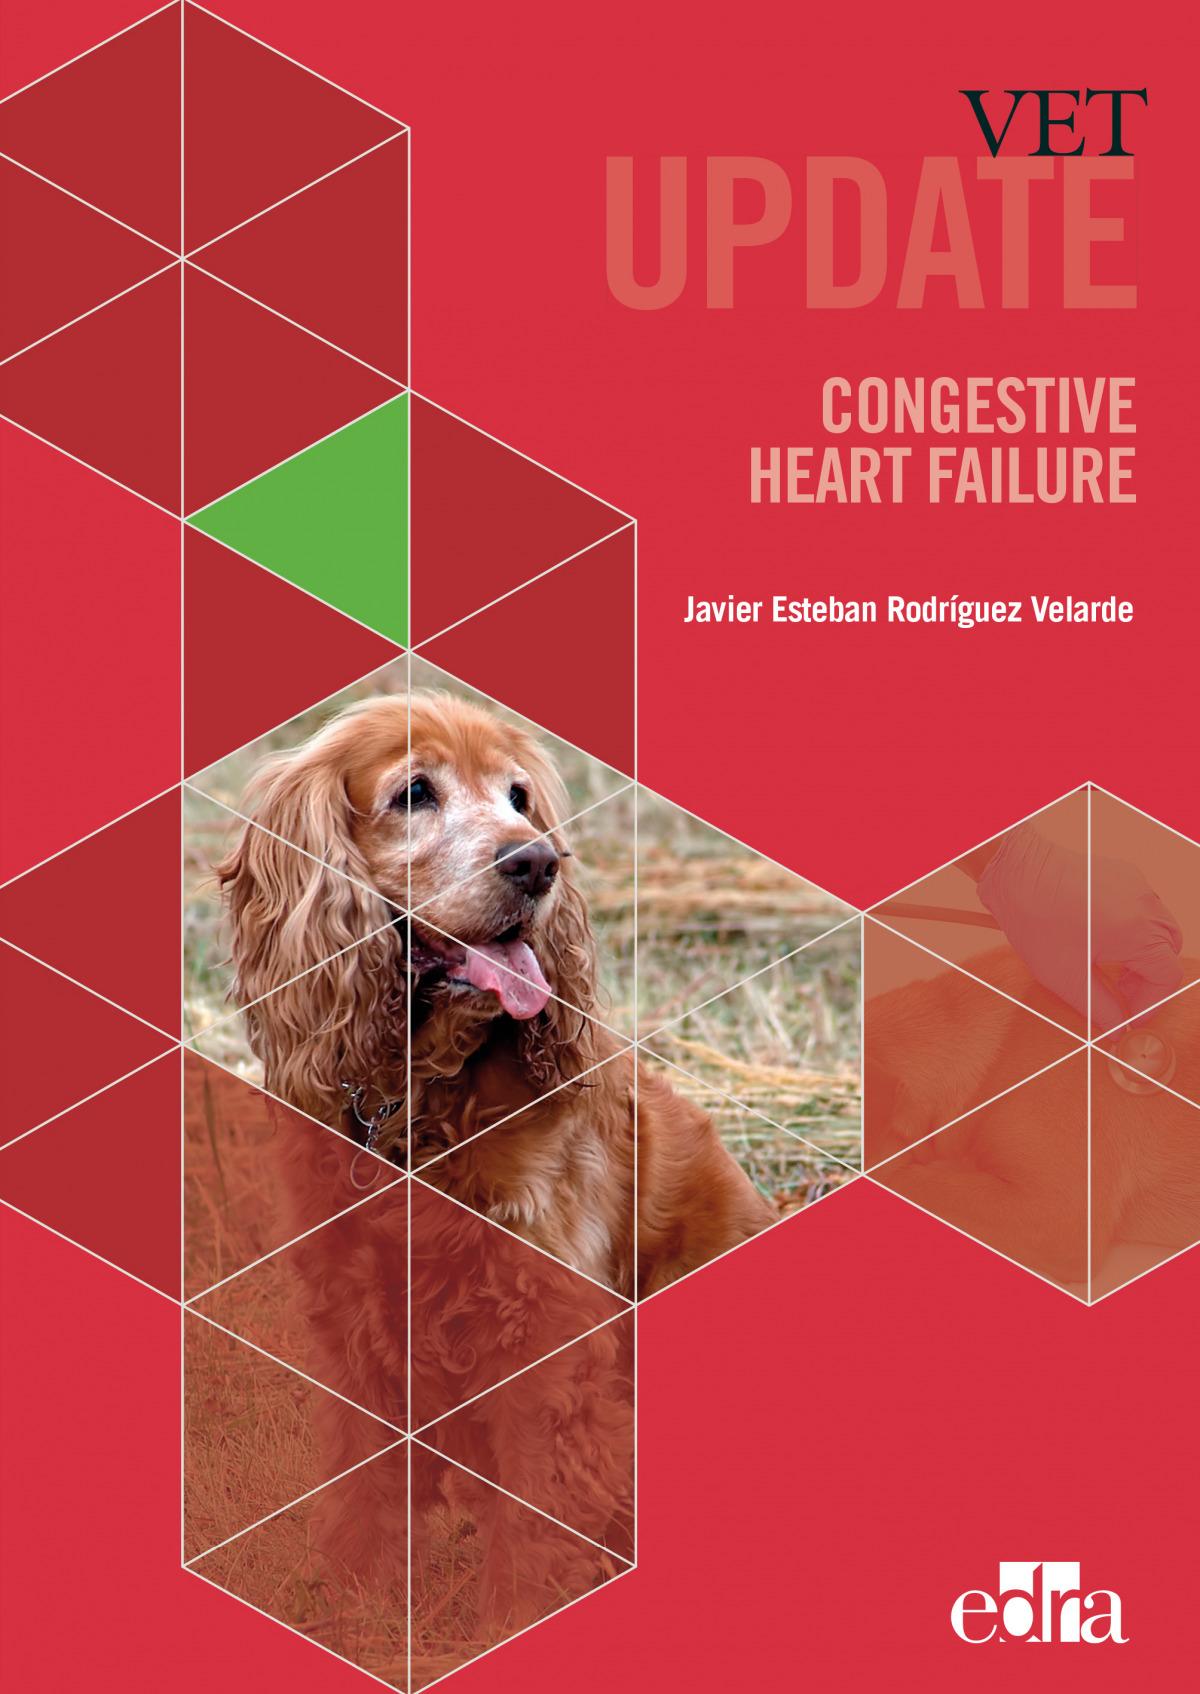 Vet Update. Congestive Heart Failure